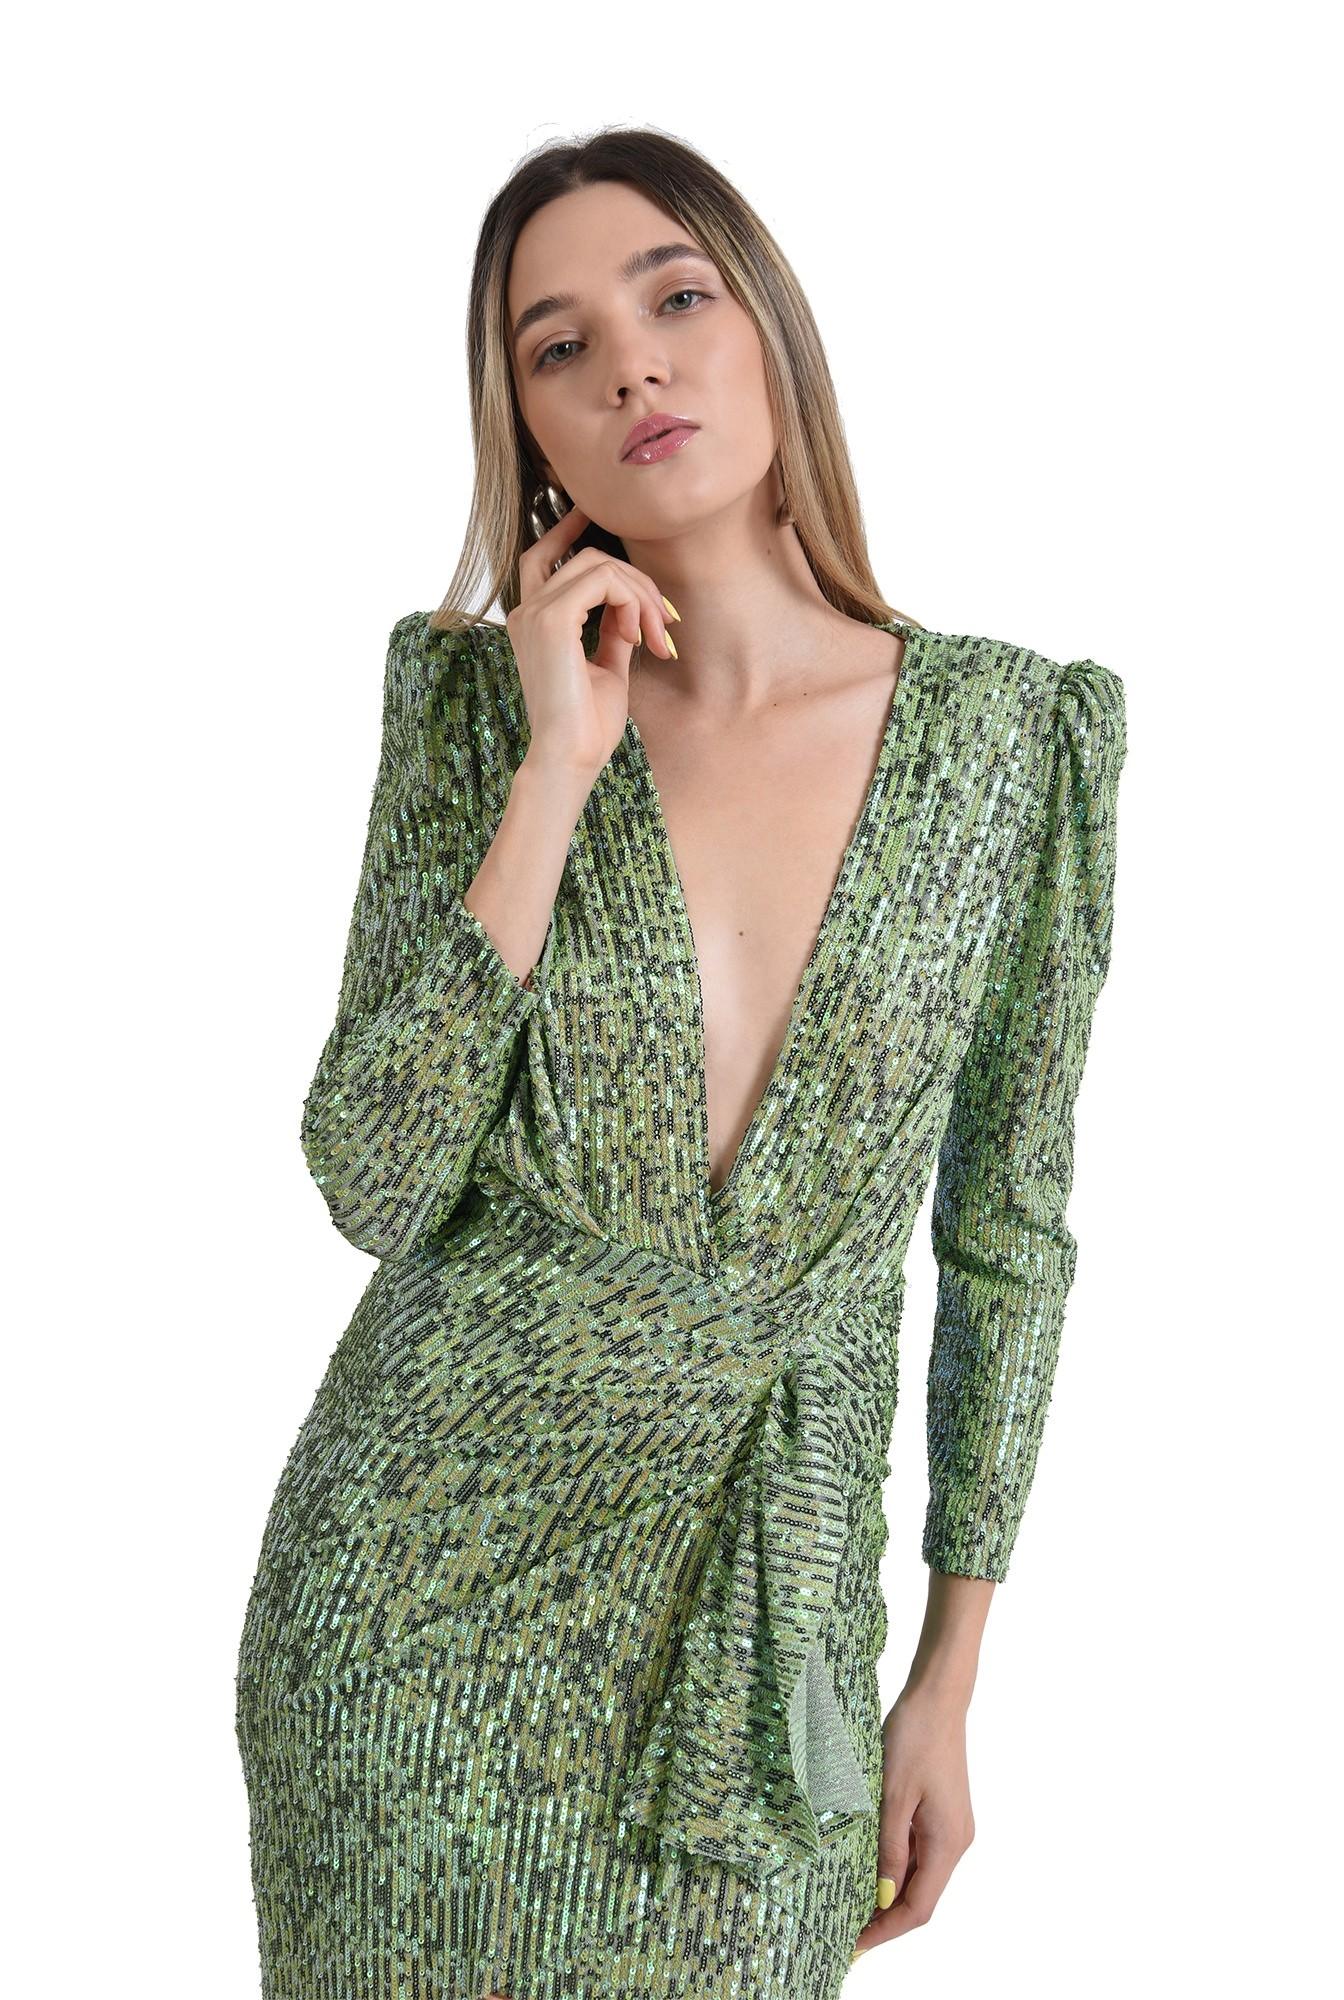 rochie scurta, eleganta, paiete, decolteu adanc, verde